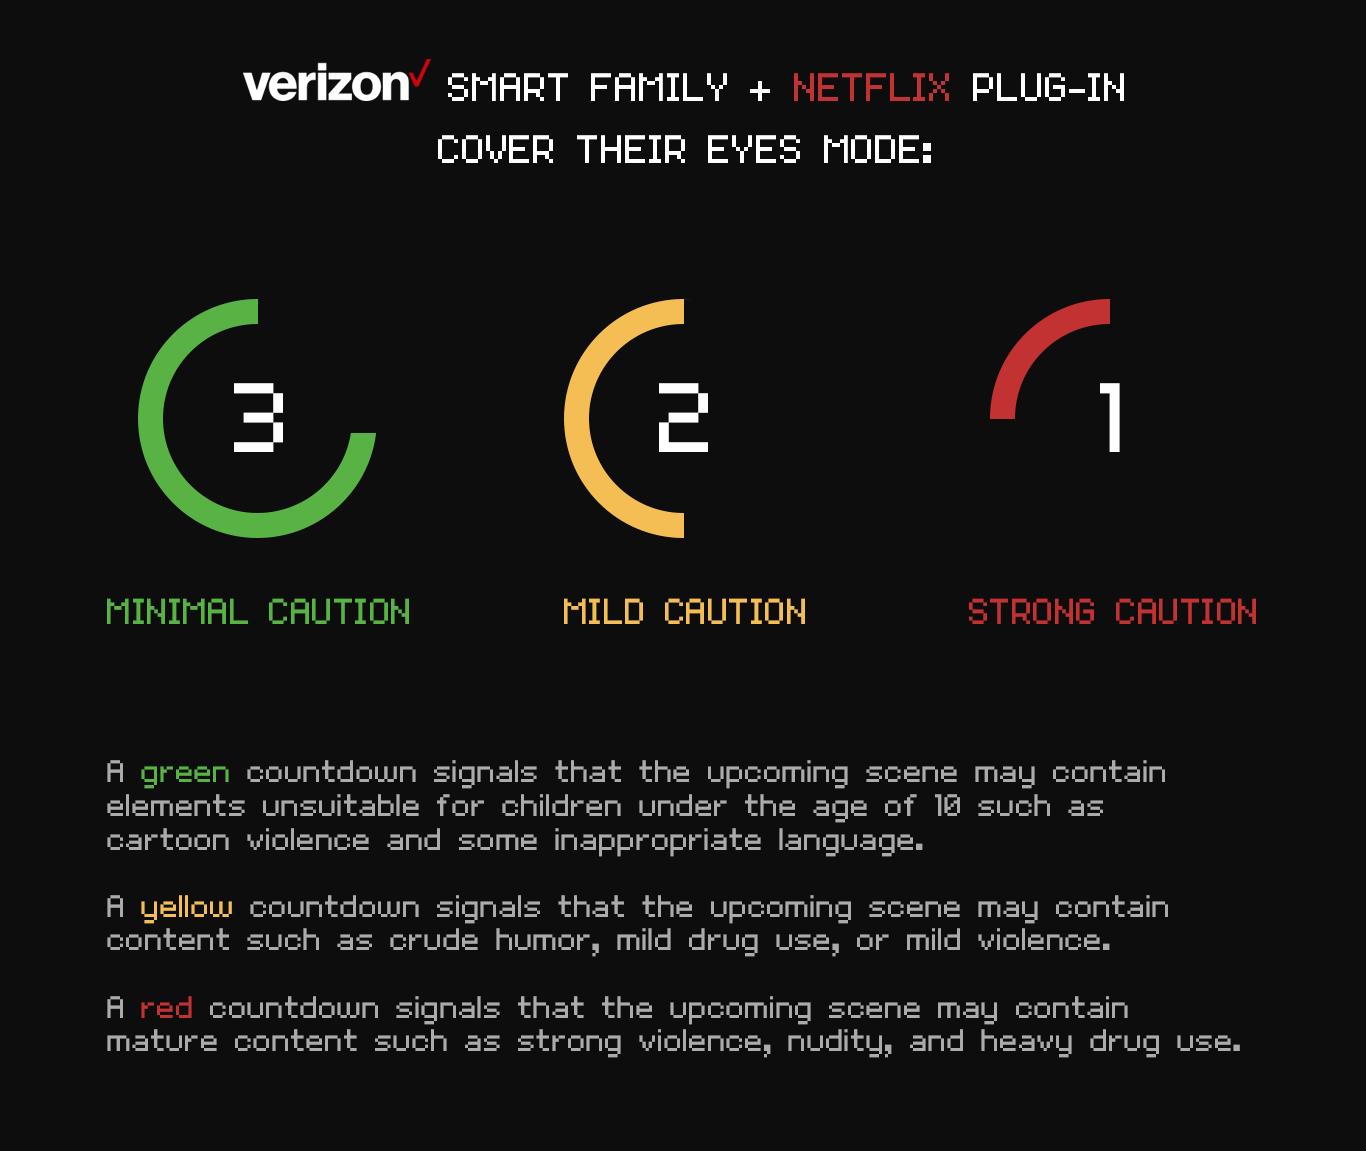 Netflix Plugin